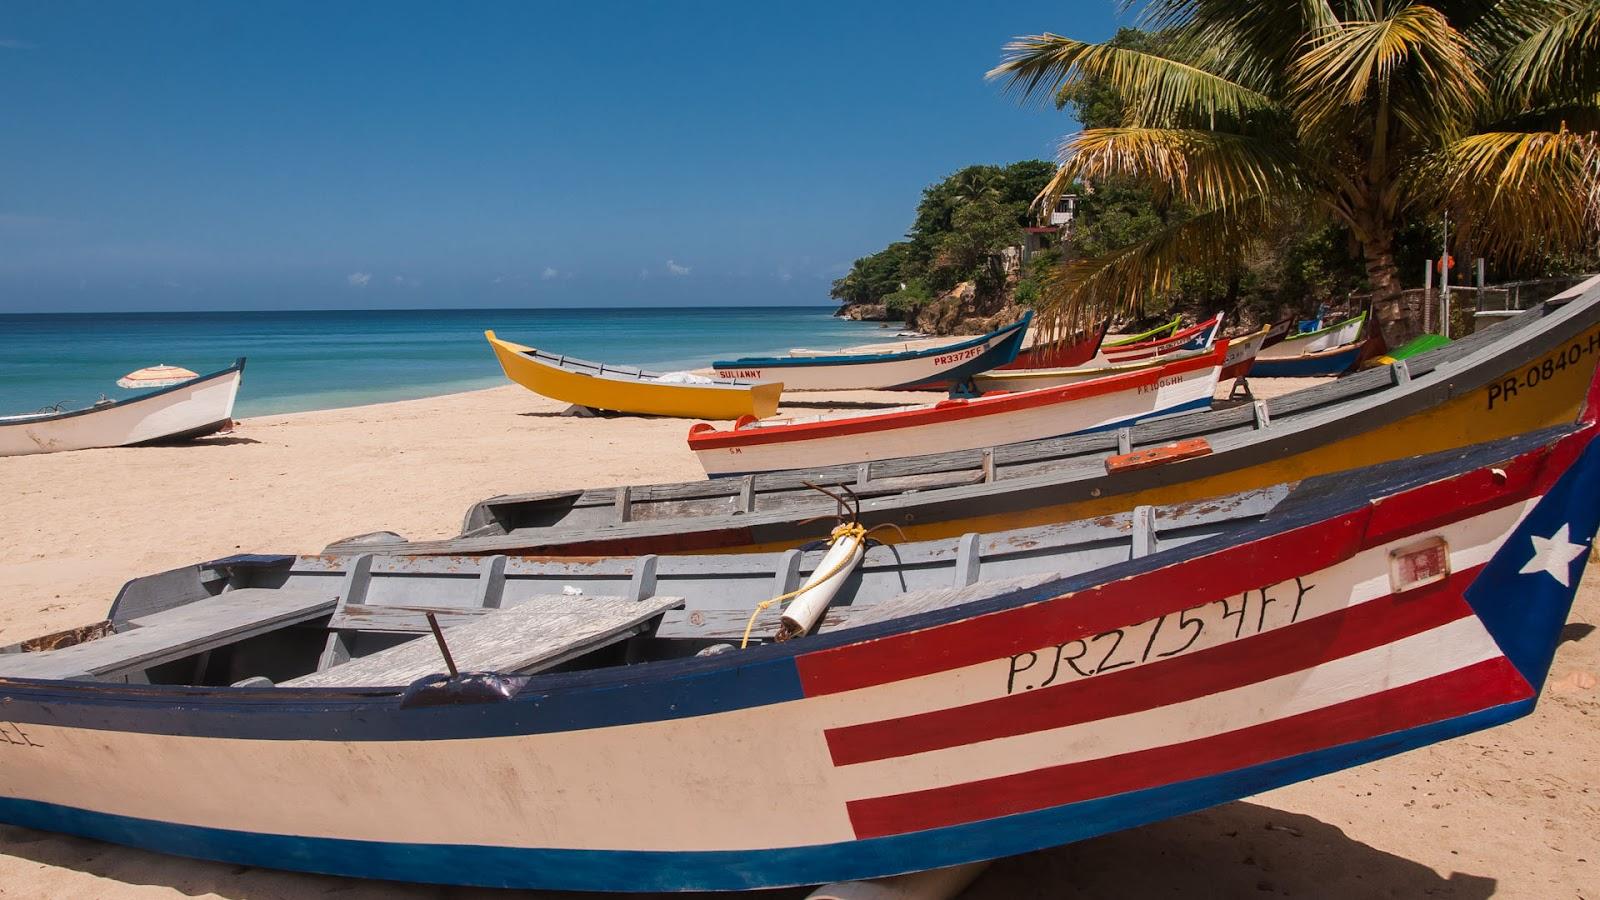 Crashboat Beach Aguadilla Puerto Rico Images